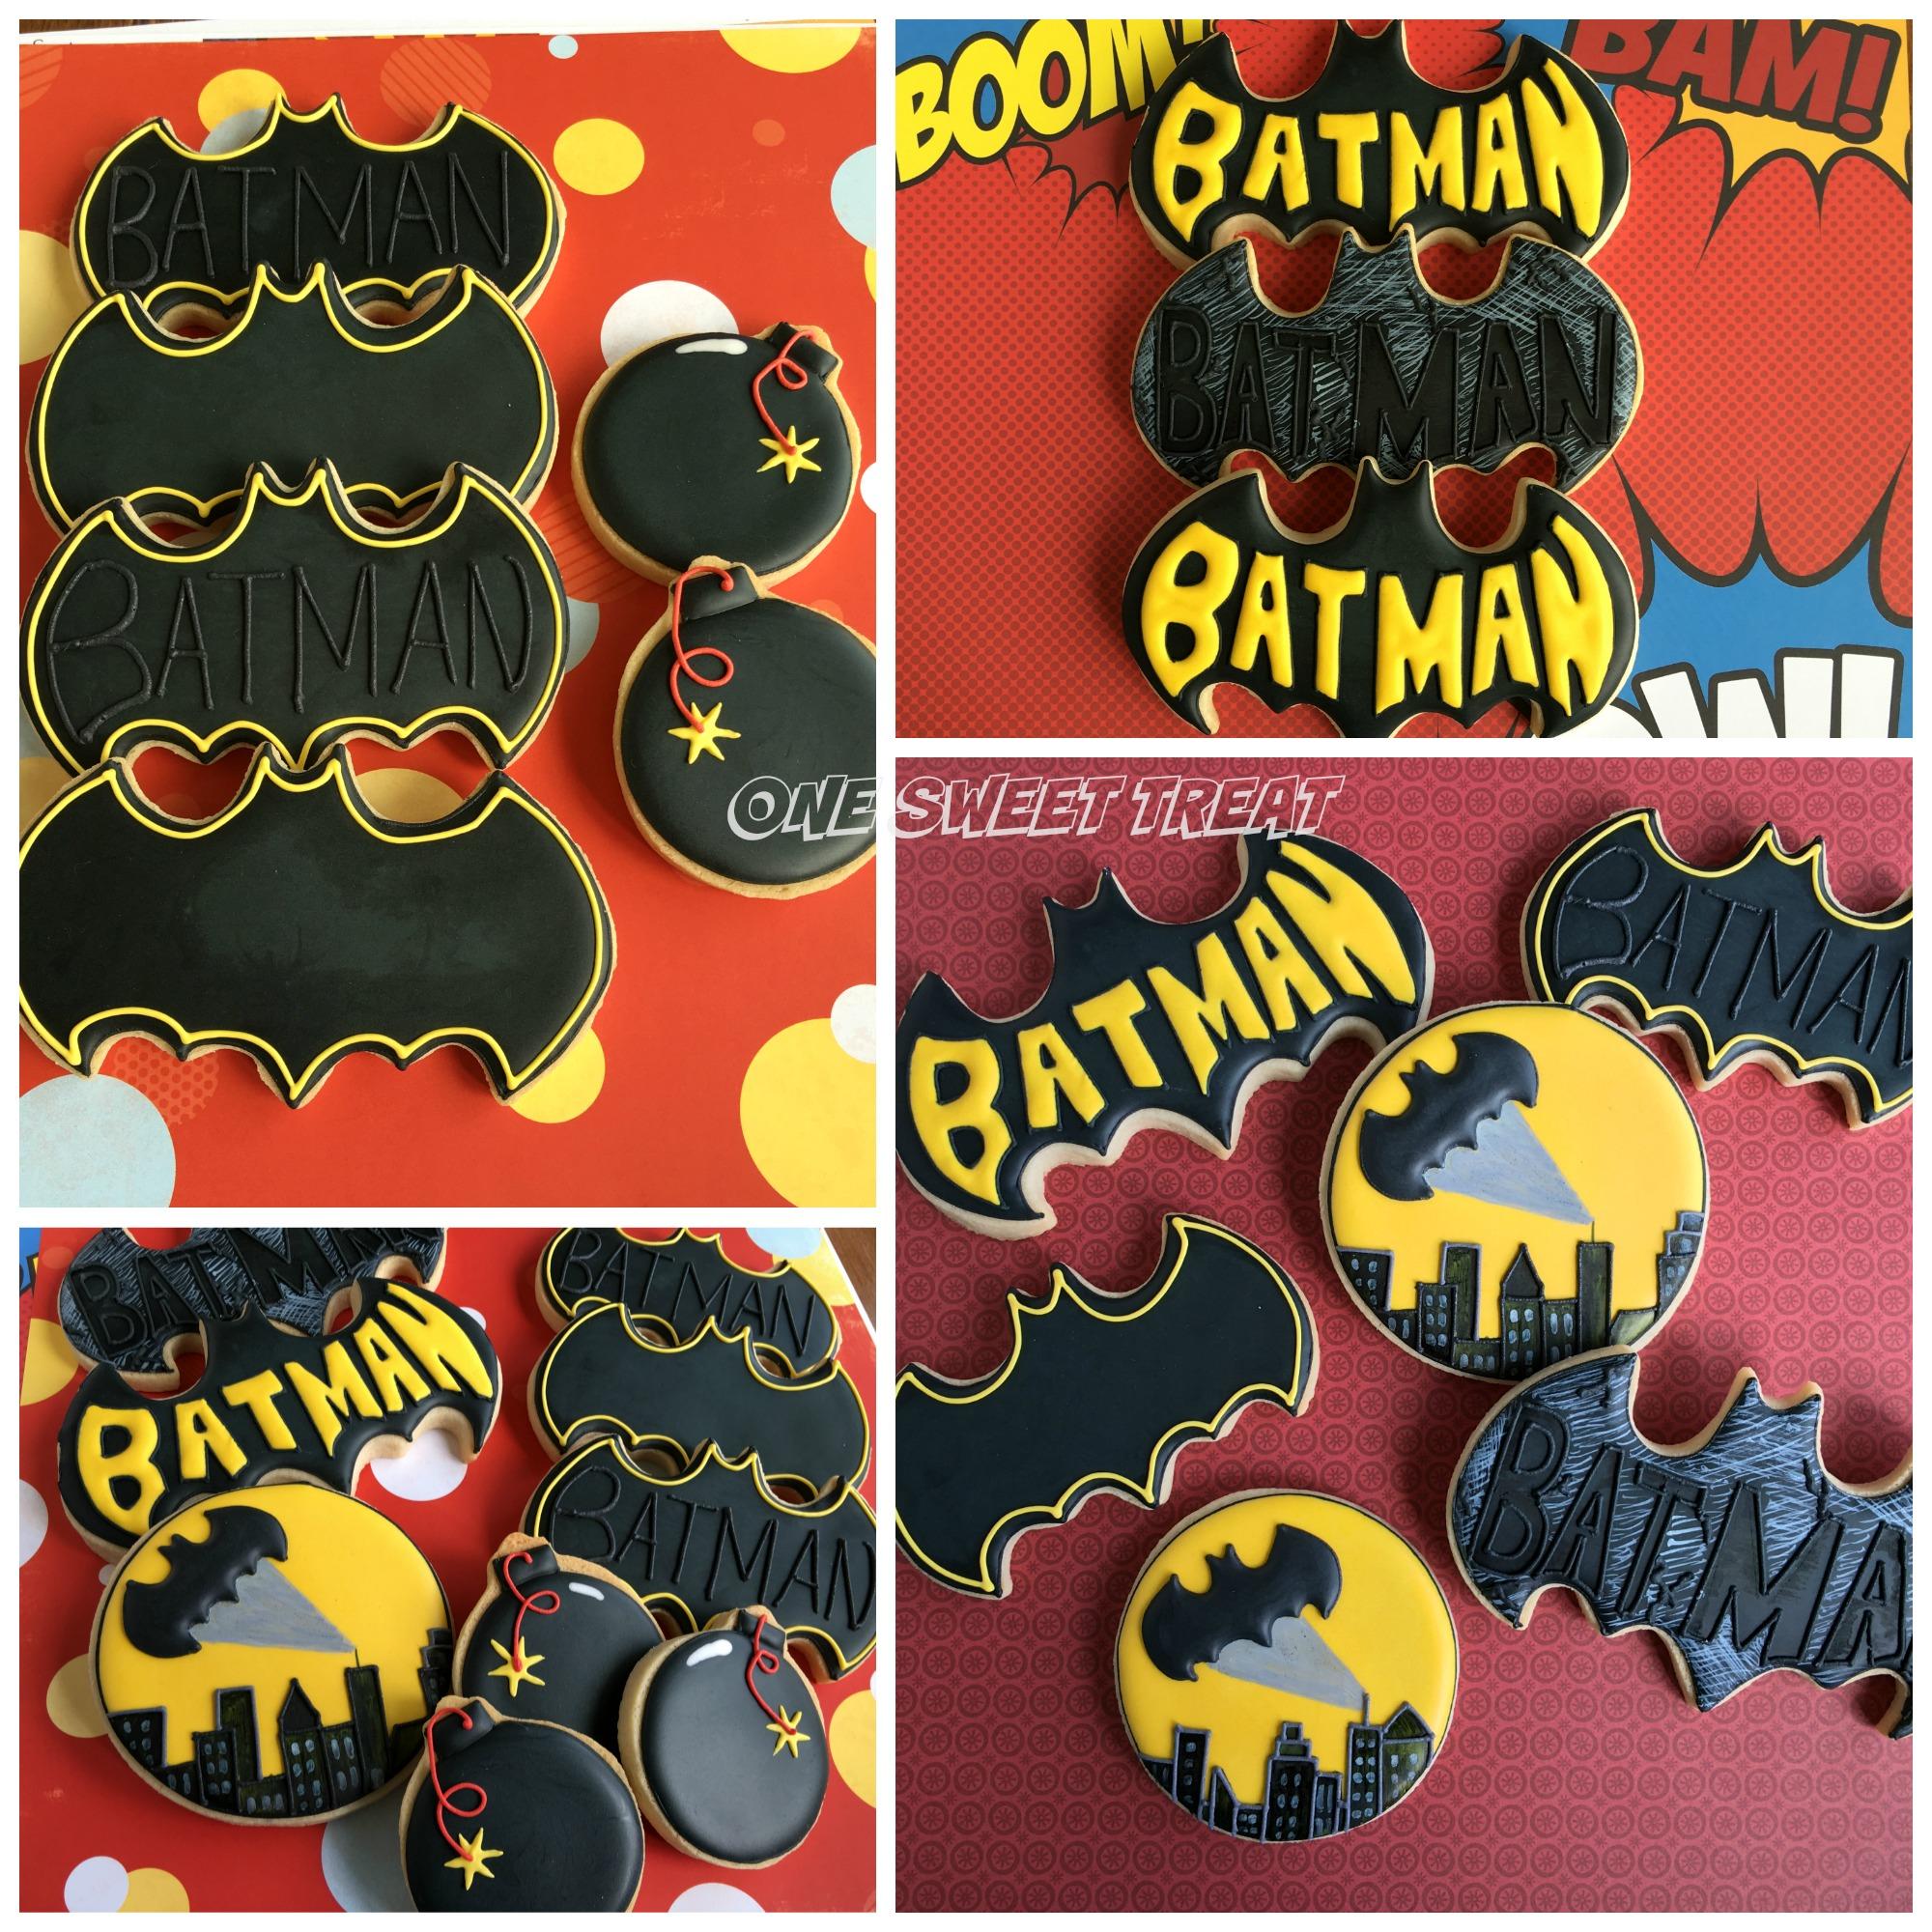 BATMAN Collage2